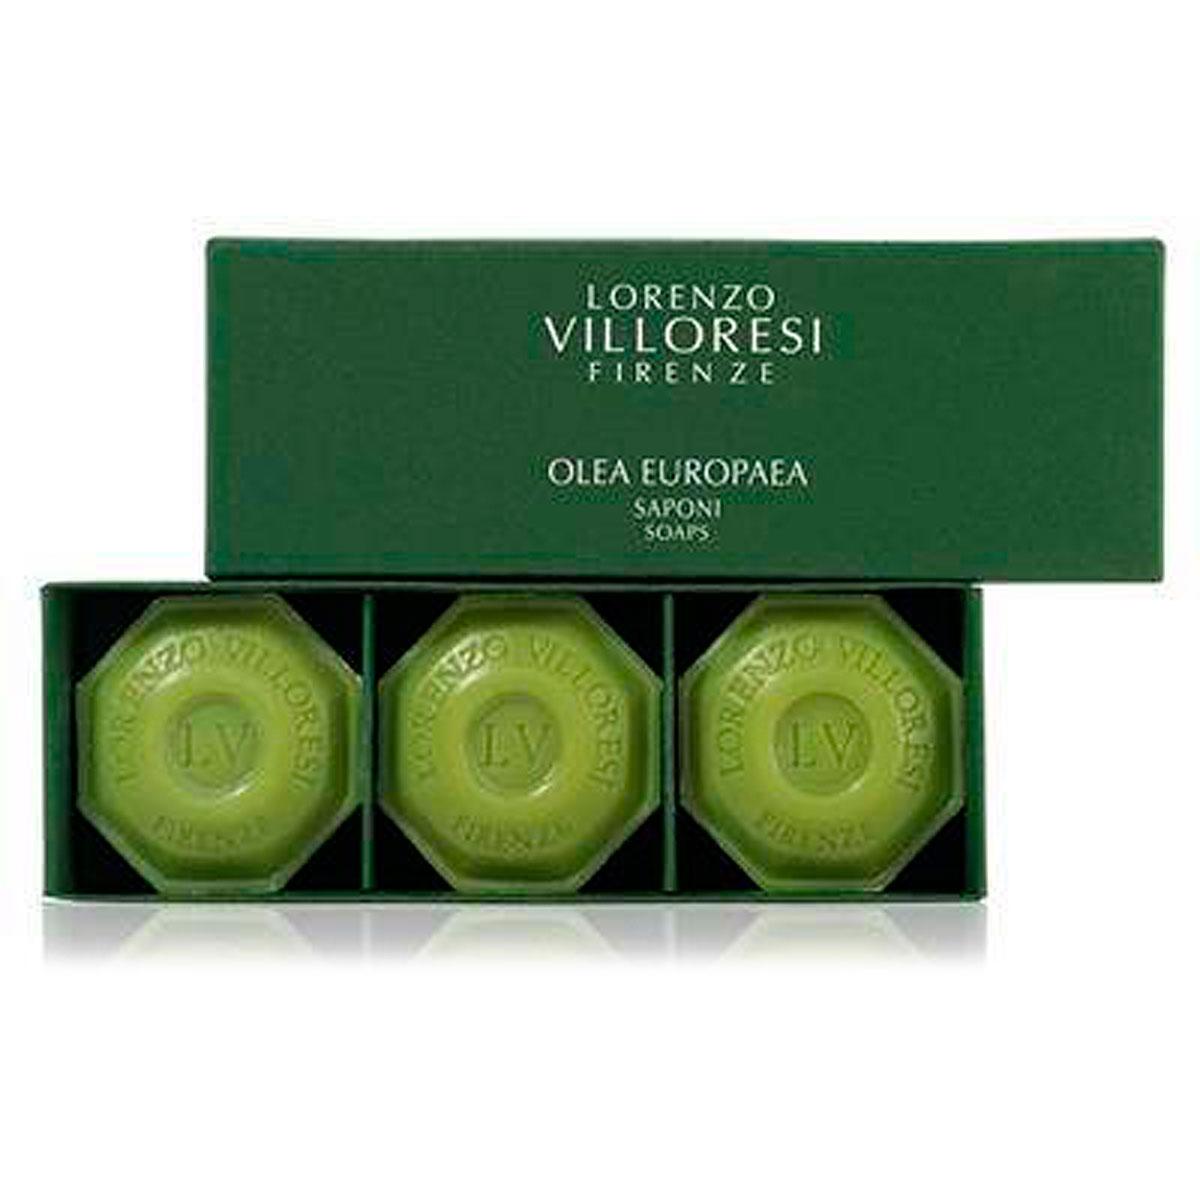 Lorenzo Villoresi Beauty for Men, Olea - Soaps, 2019